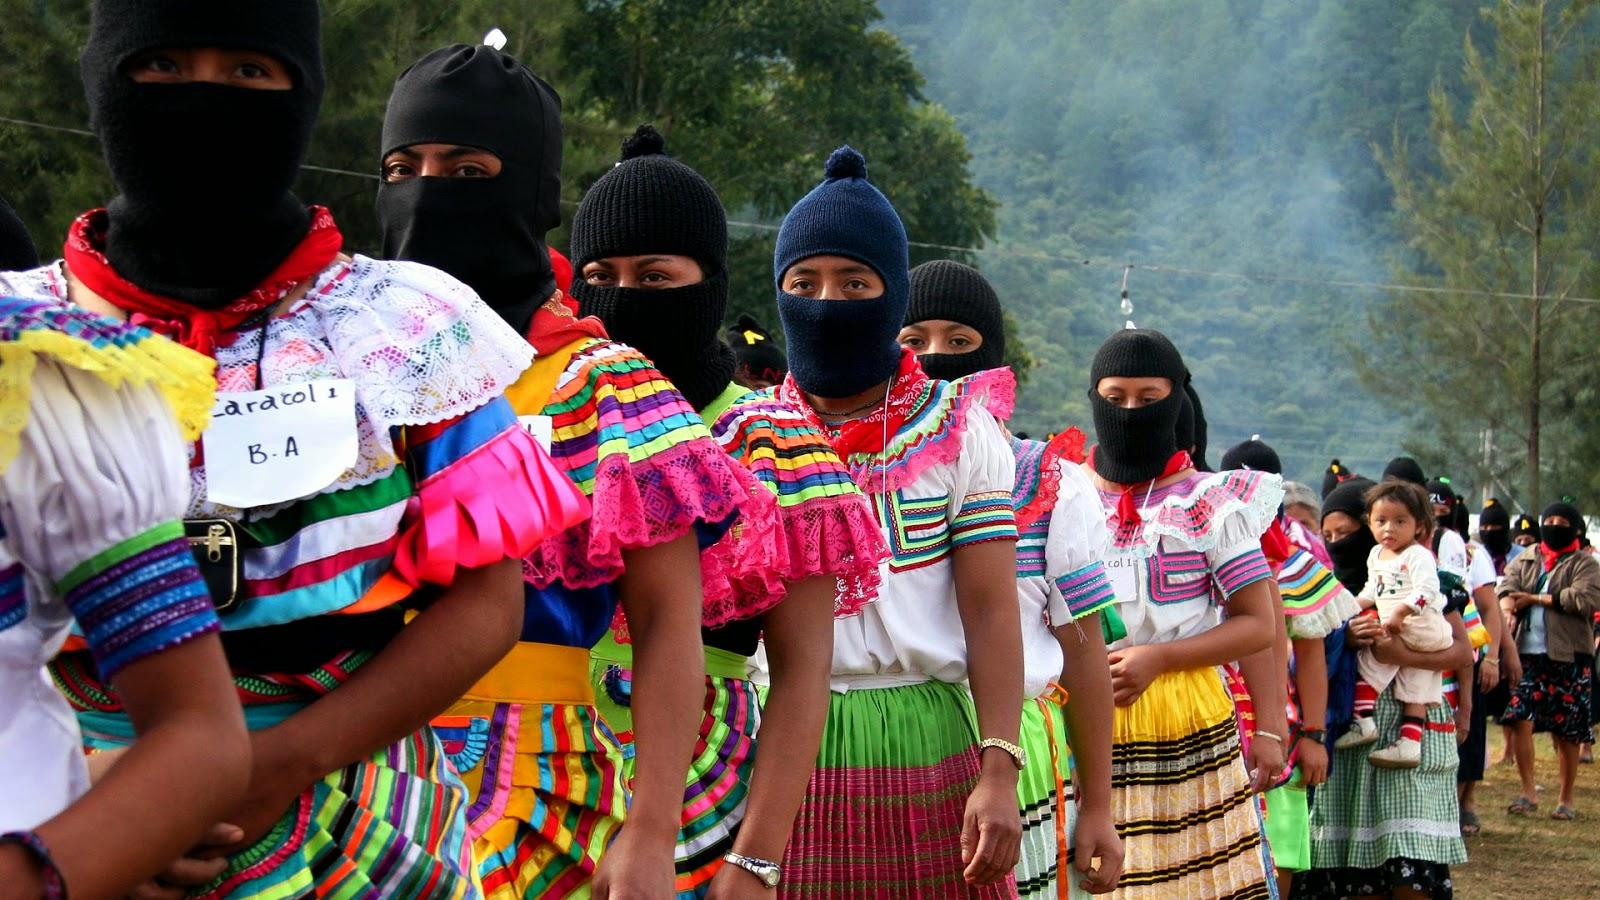 http://4.bp.blogspot.com/-2cKVd5TVQfg/U6jbaTSuwbI/AAAAAAAAdVg/f_xE4KZq-8M/s1600/EZLN_mujeresLaRealidad.jpg